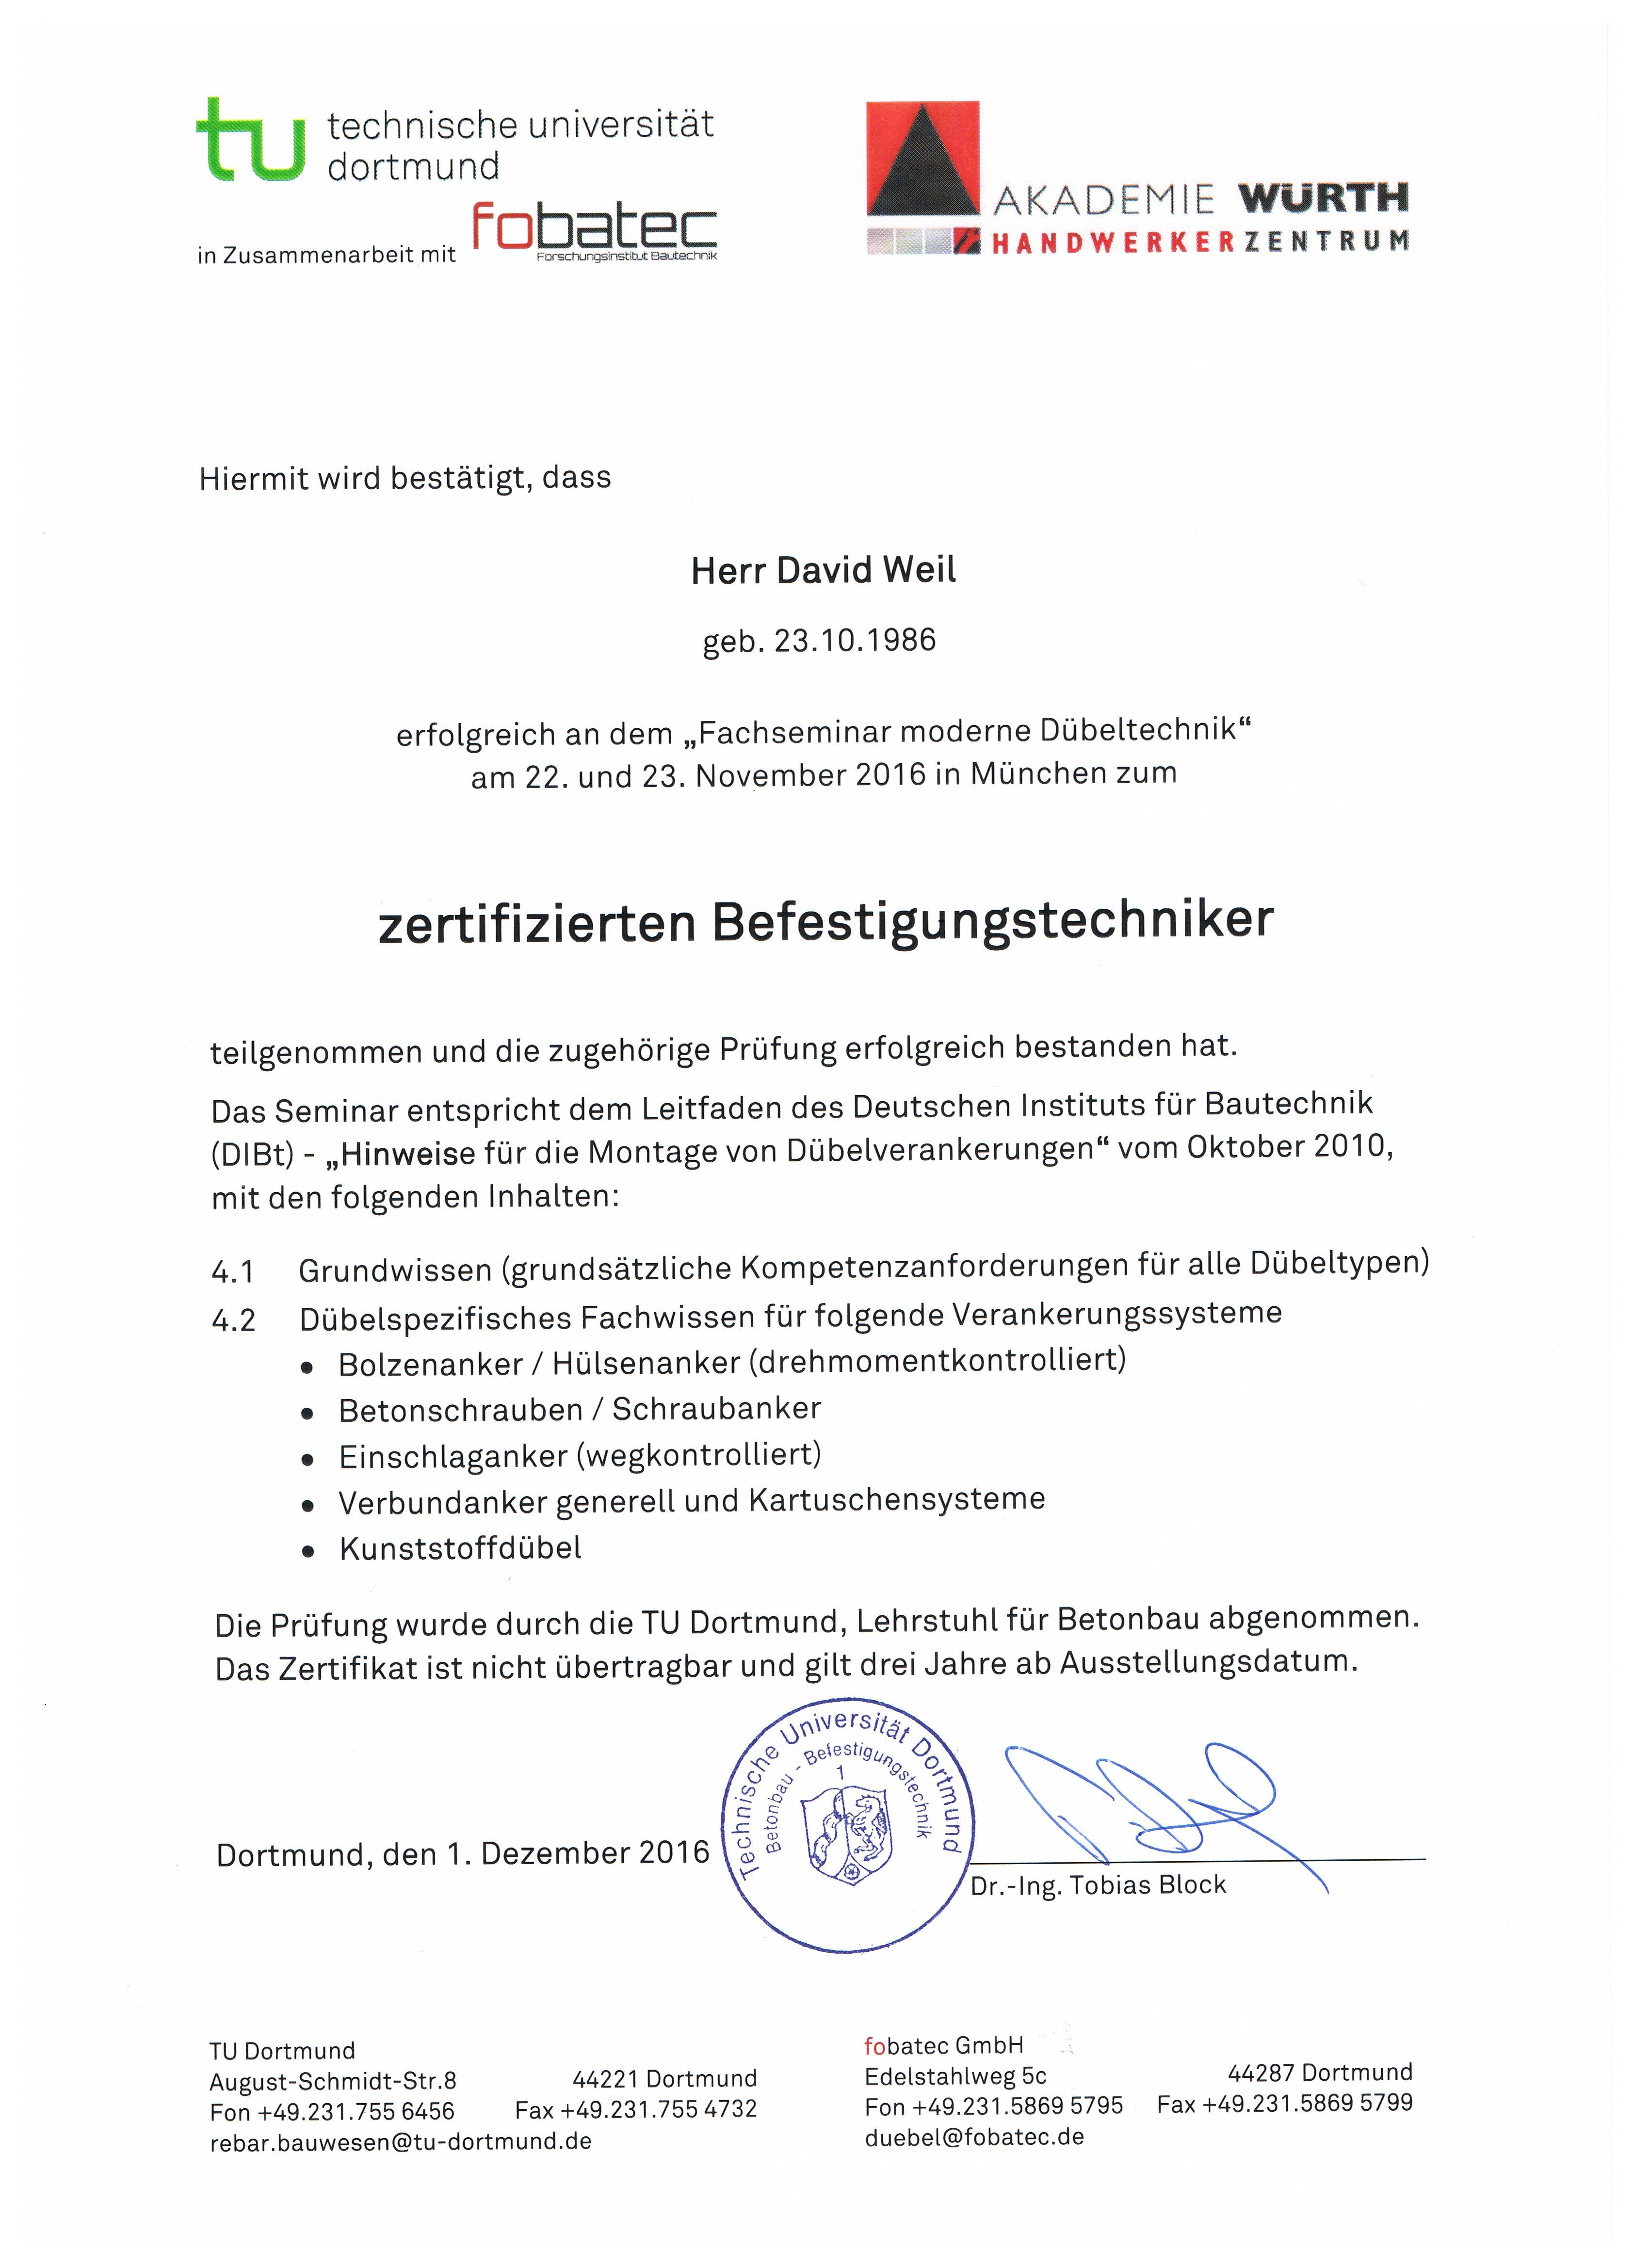 Zertifizierter Befestigungstechniker